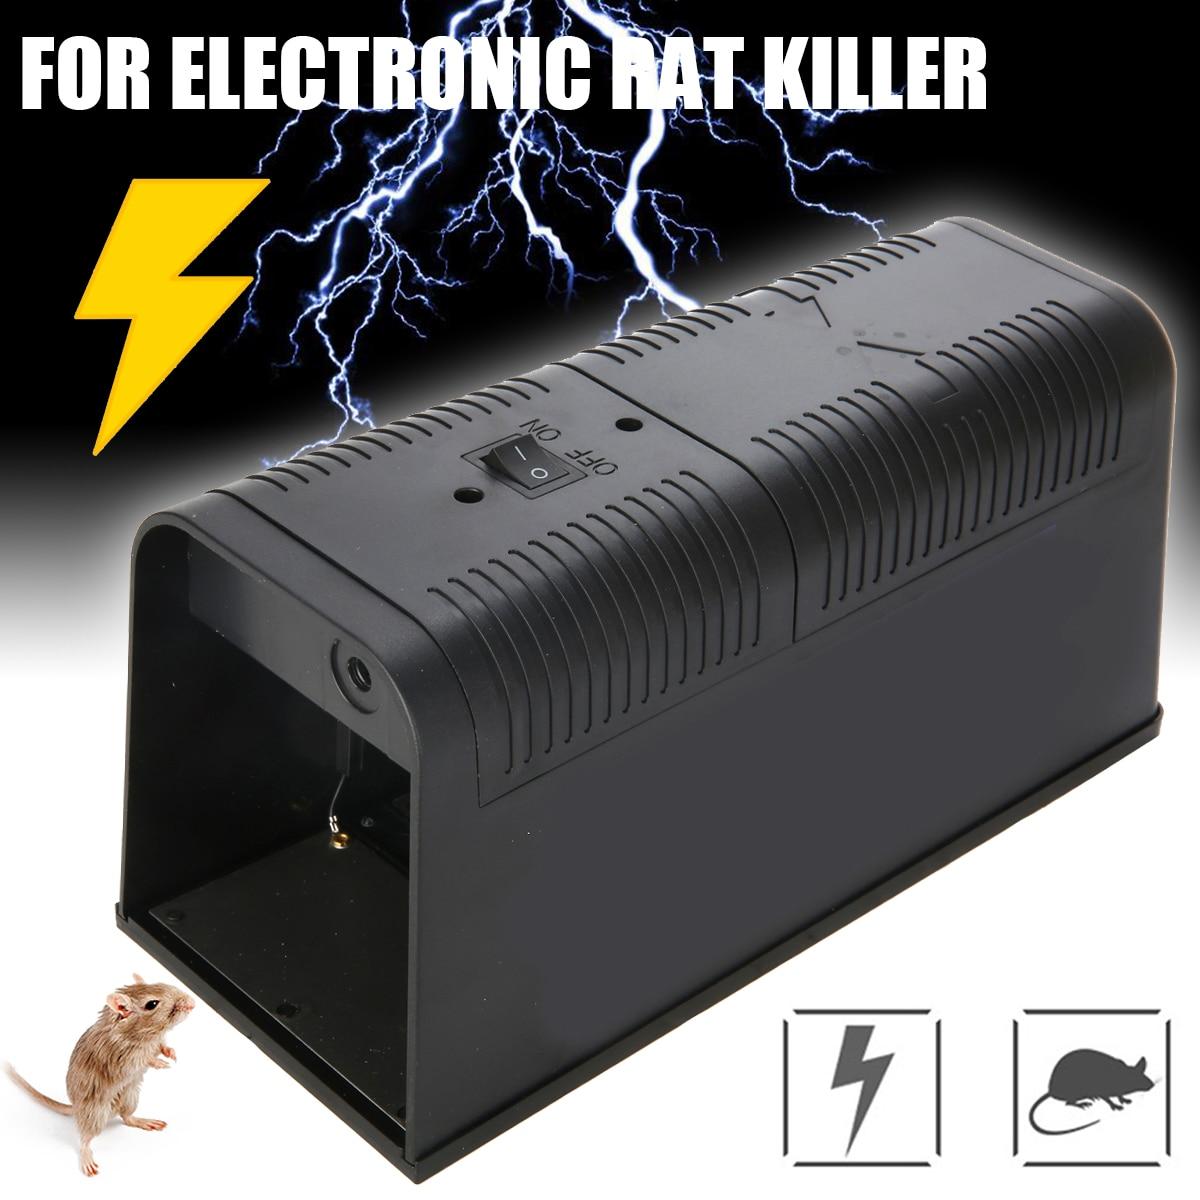 Electronic Mouse Trap Control Rat Killer Electric Pest Mice Traps Kitchen Home Pest Control